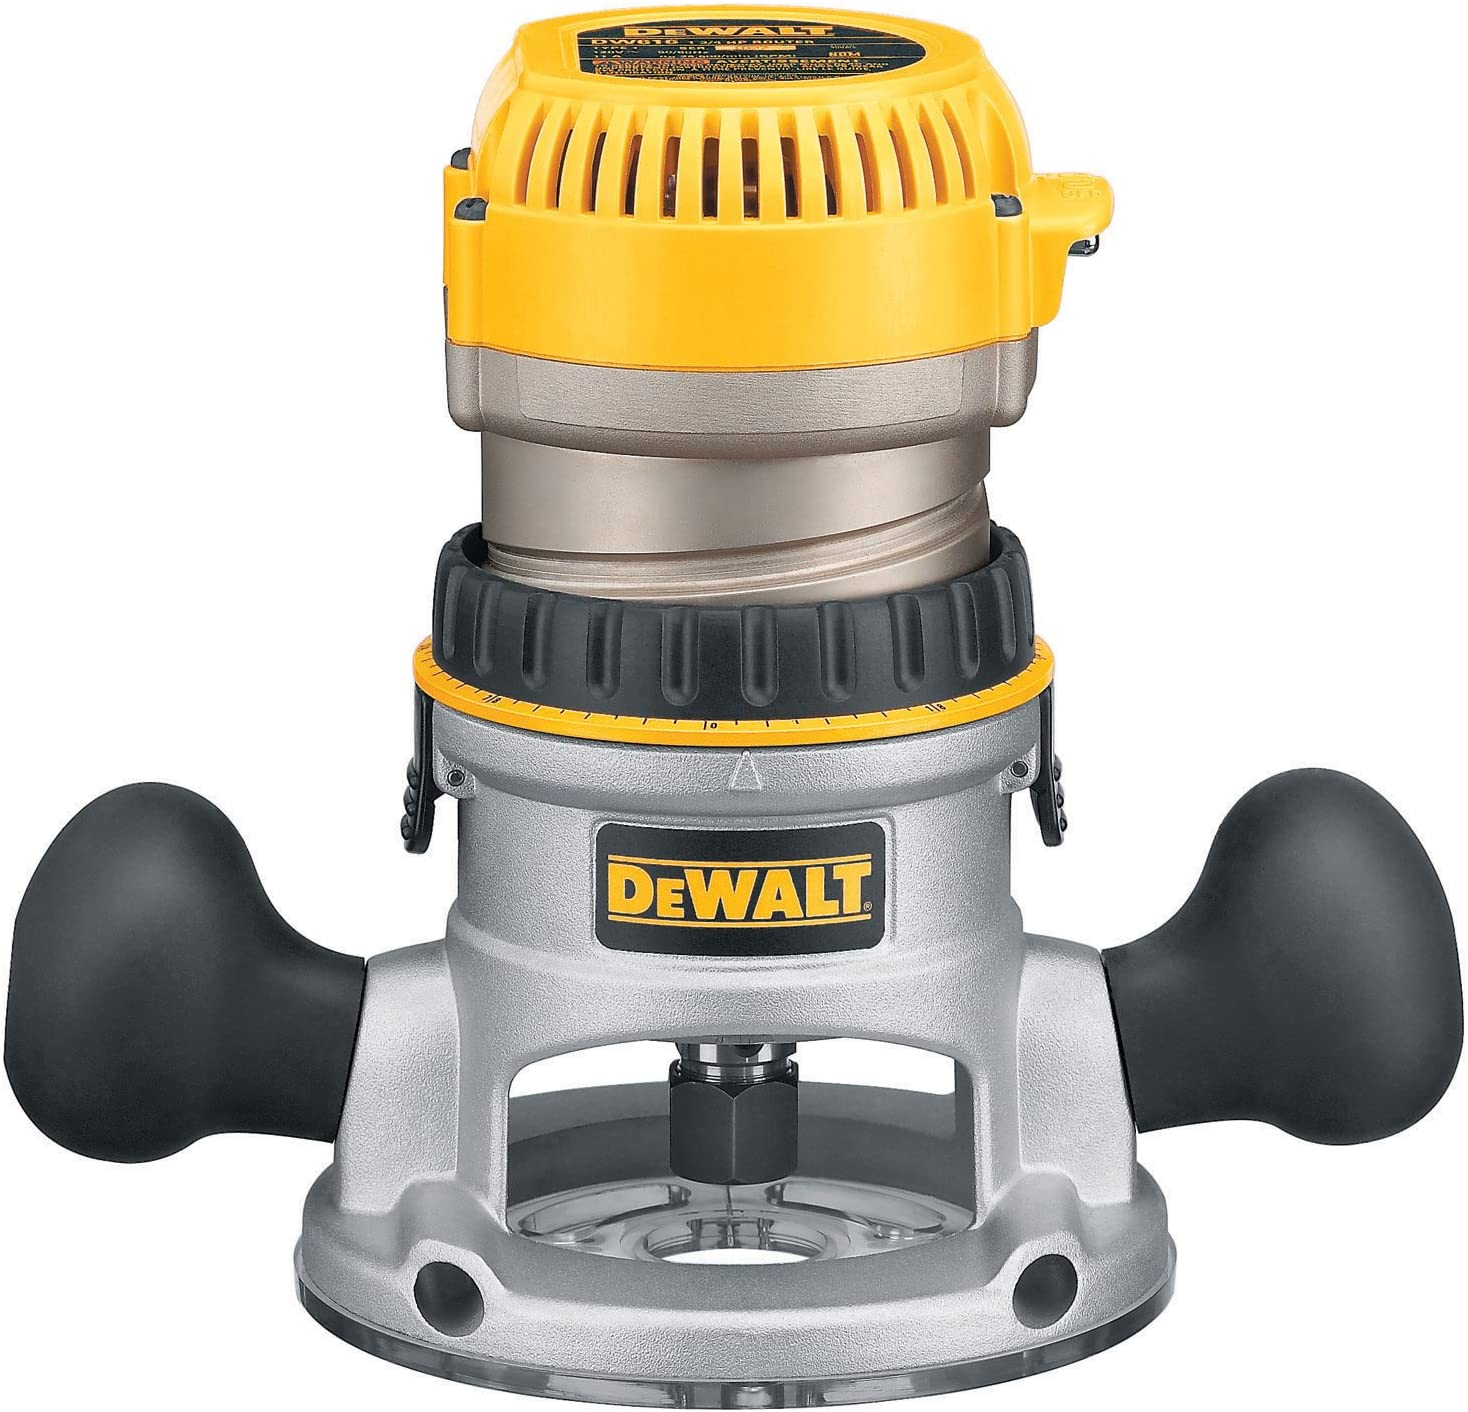 DEWALT DW616 1.75 HP Wood Router